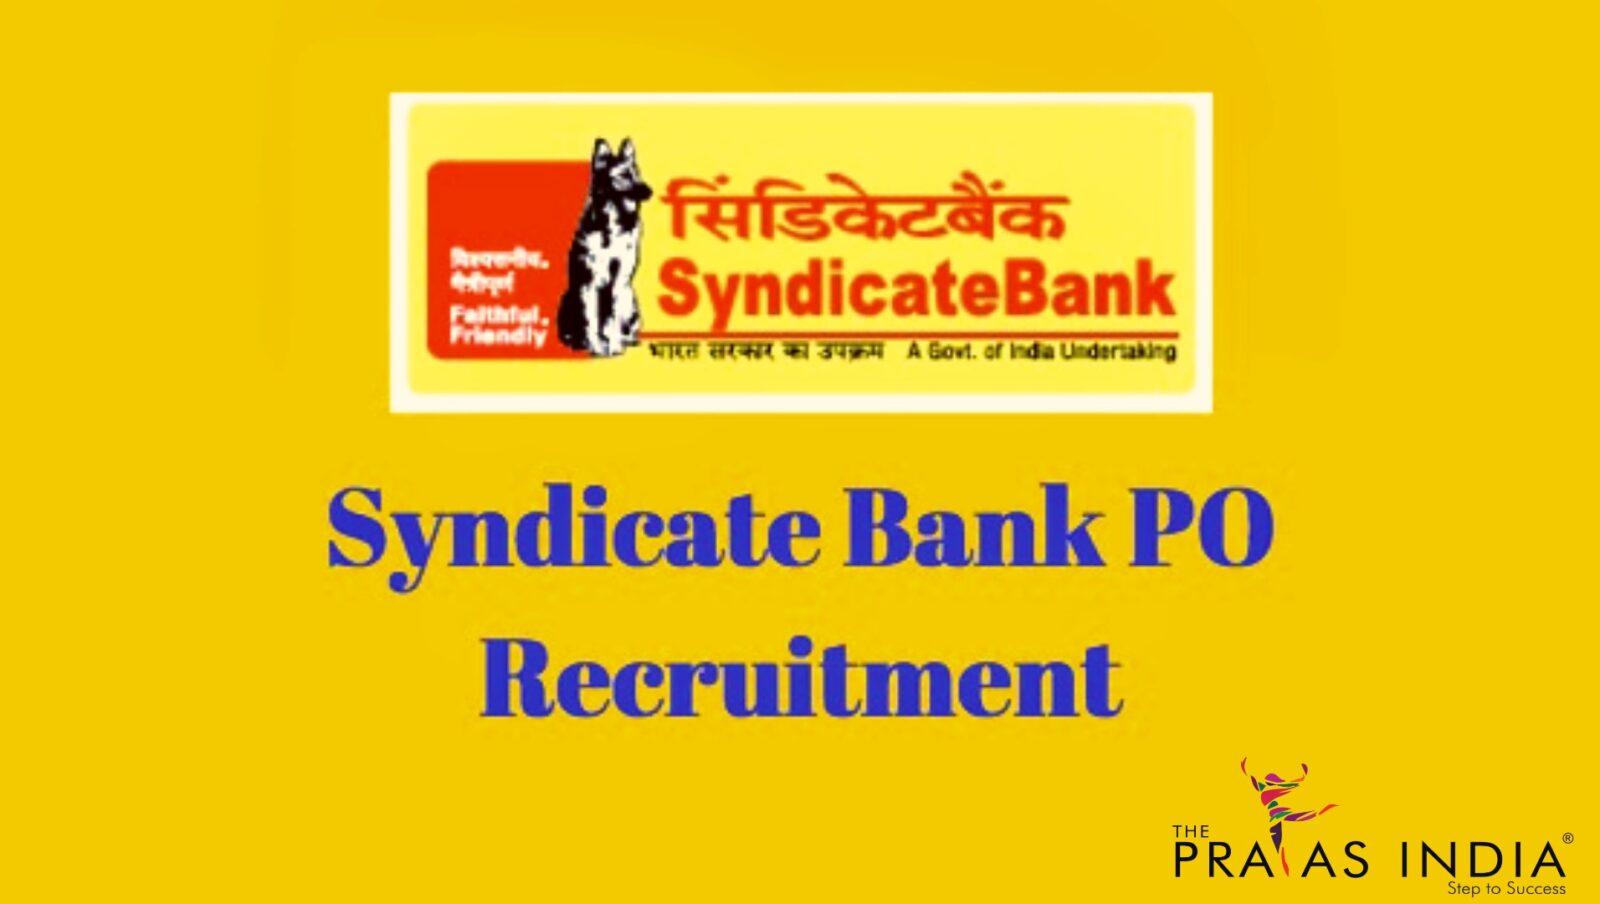 syndicate bank po recruitment 2014-15 exam date